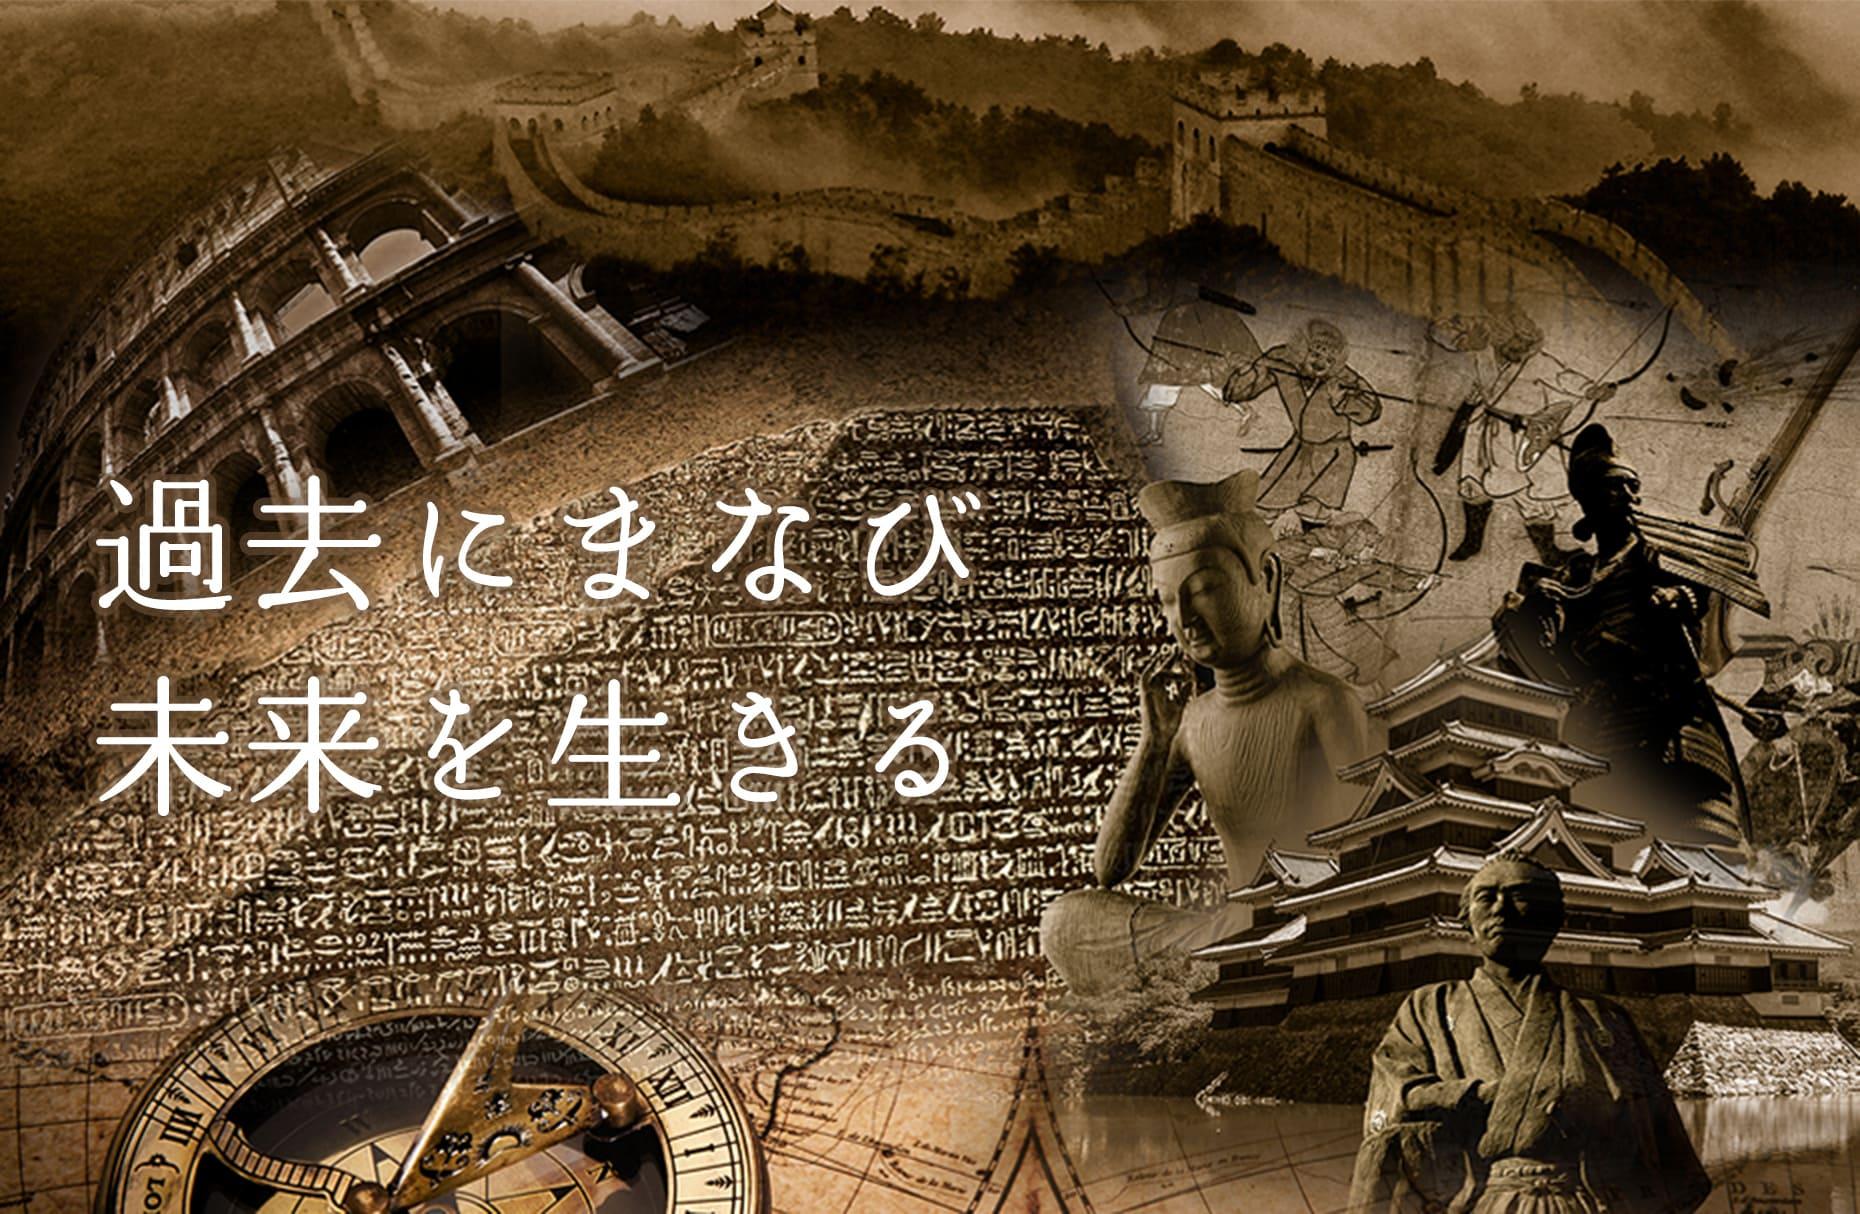 歴史能力検定 公式サイト